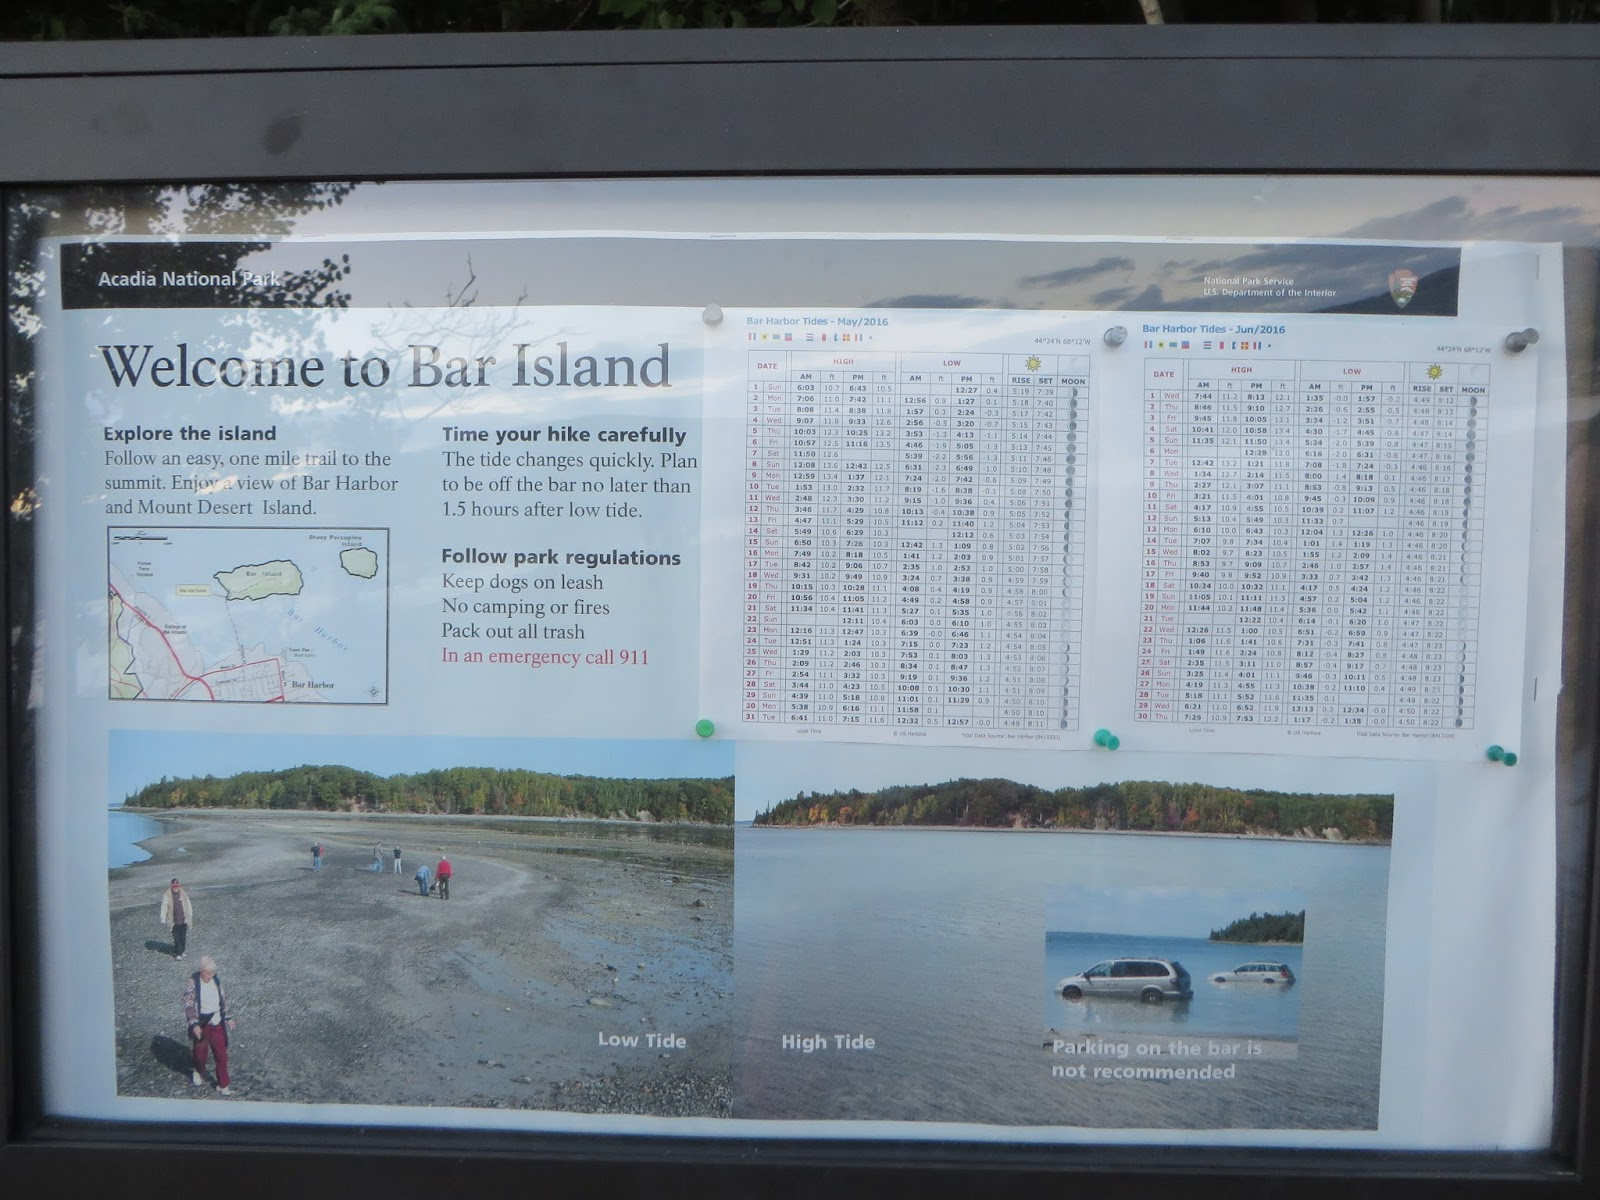 Tybee island tide chart images free any chart examples moon tide chart choice image free any chart examples tide chart portsmouth nh gallery free any nvjuhfo Choice Image